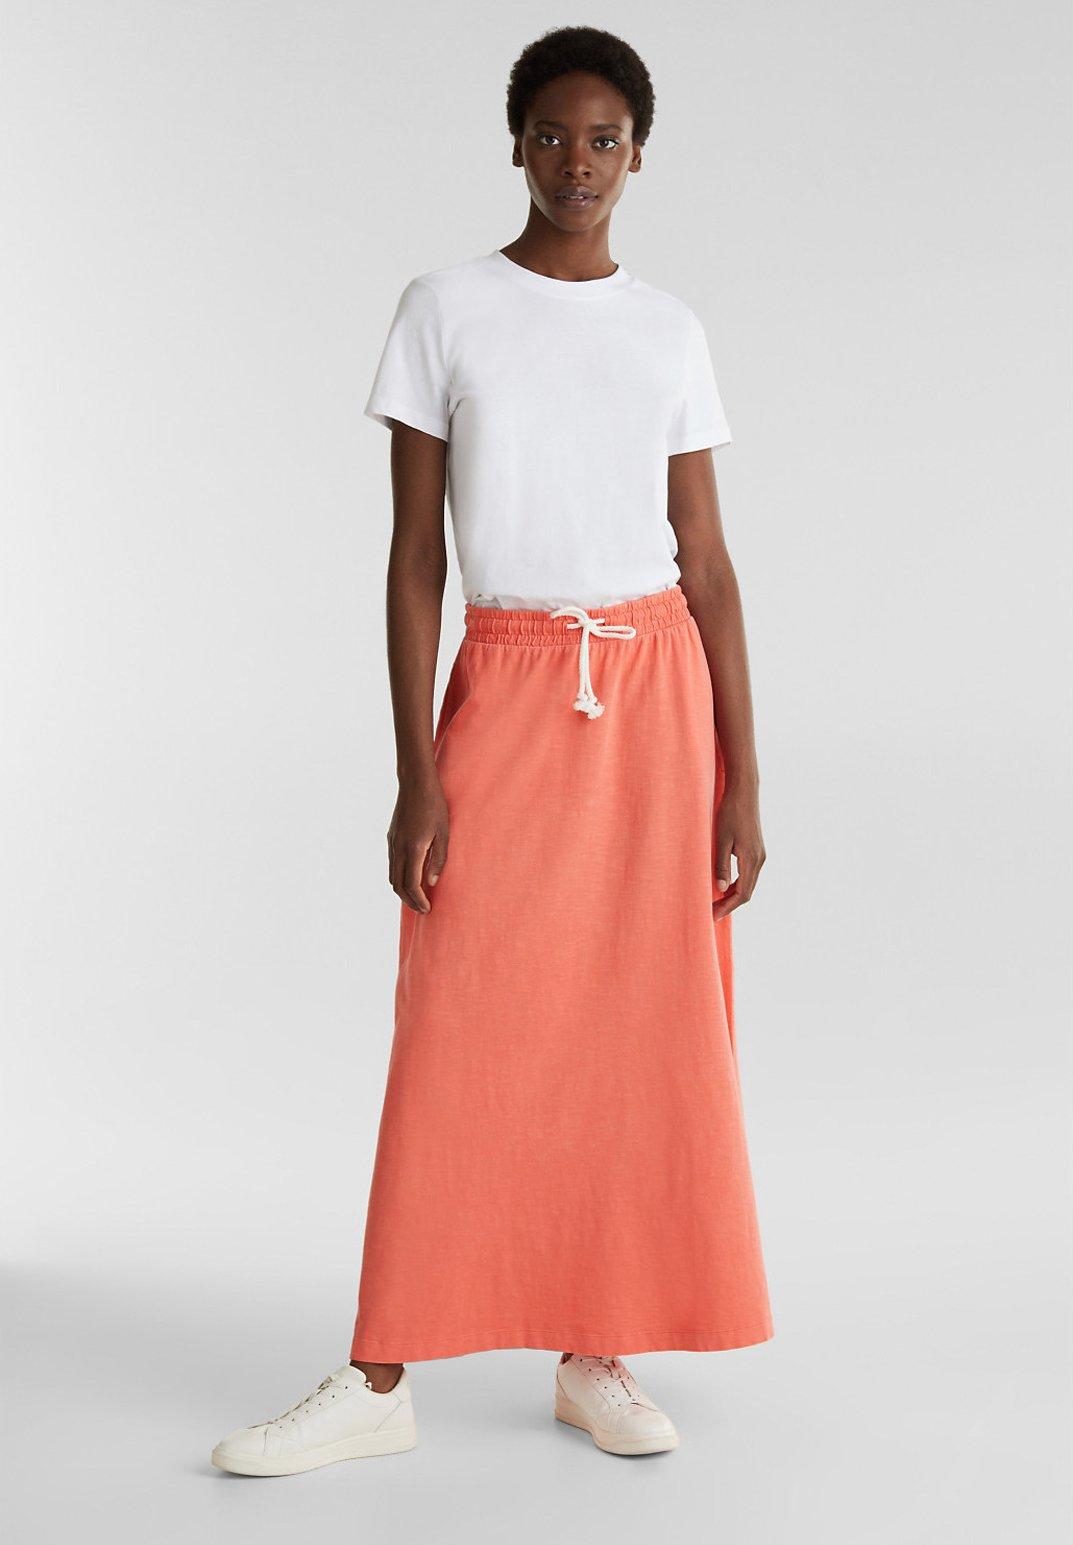 Femme SLUB-JERSEY-ROCK AUS 100% ORGANIC COTTON - Jupe longue